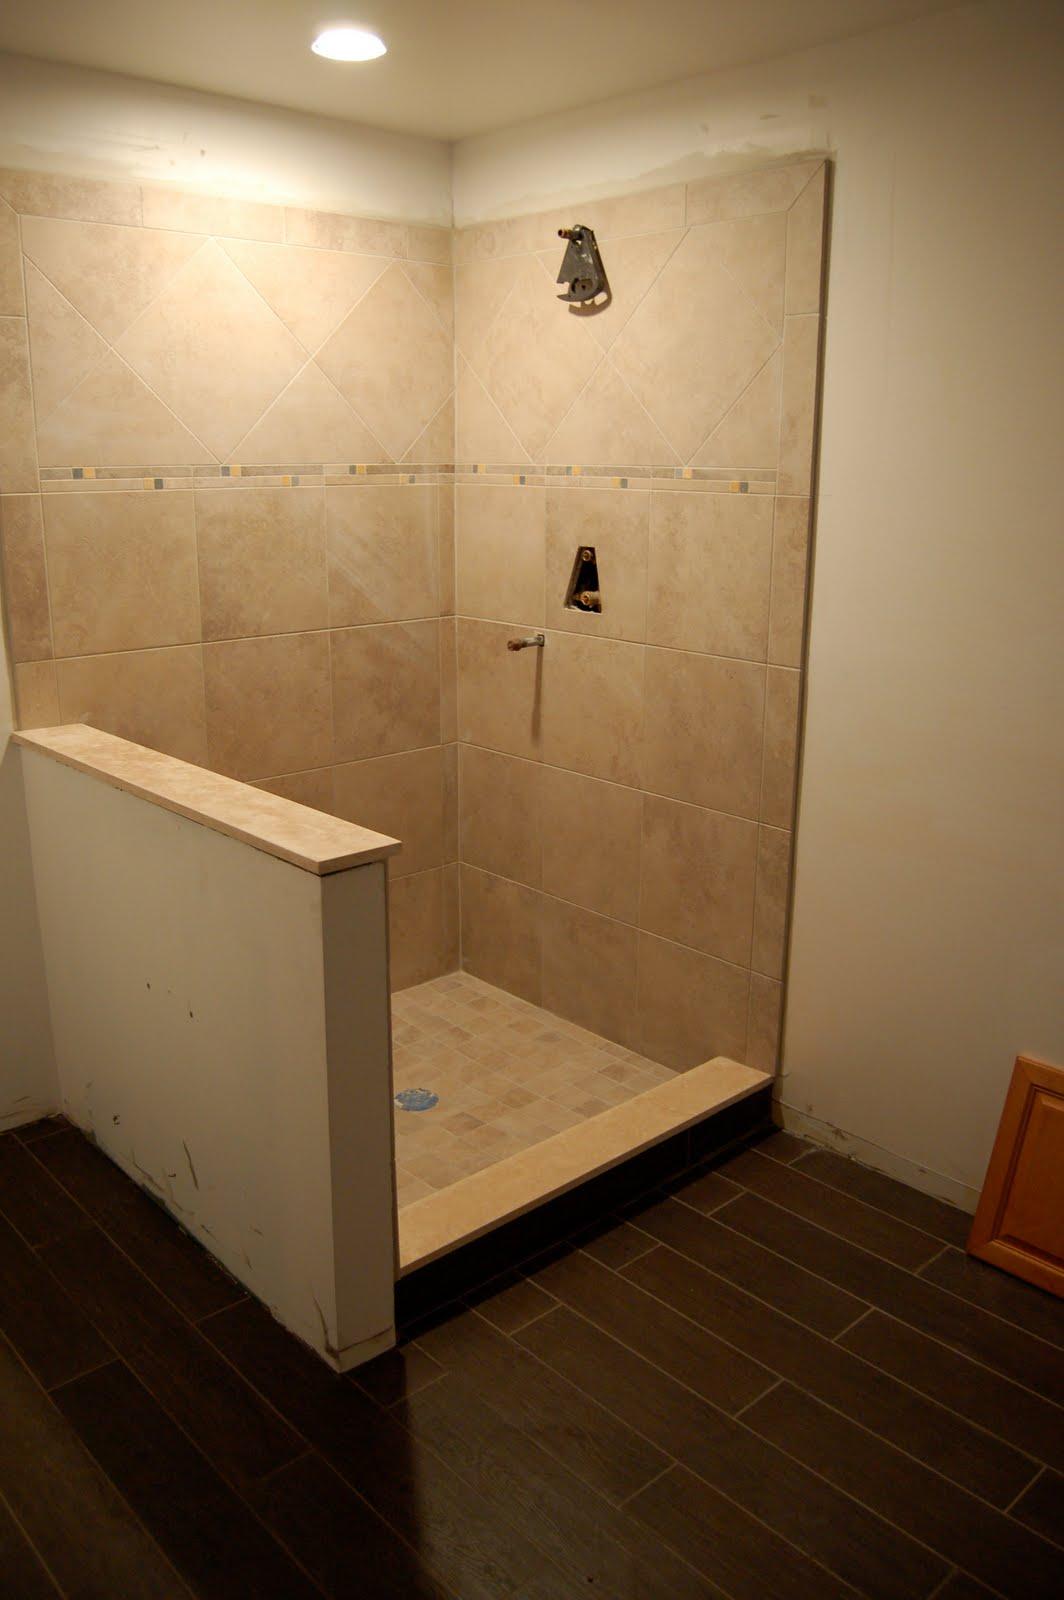 Knitsmitten bathroom remodel days 14 18 for Bathroom remodel in 3 days